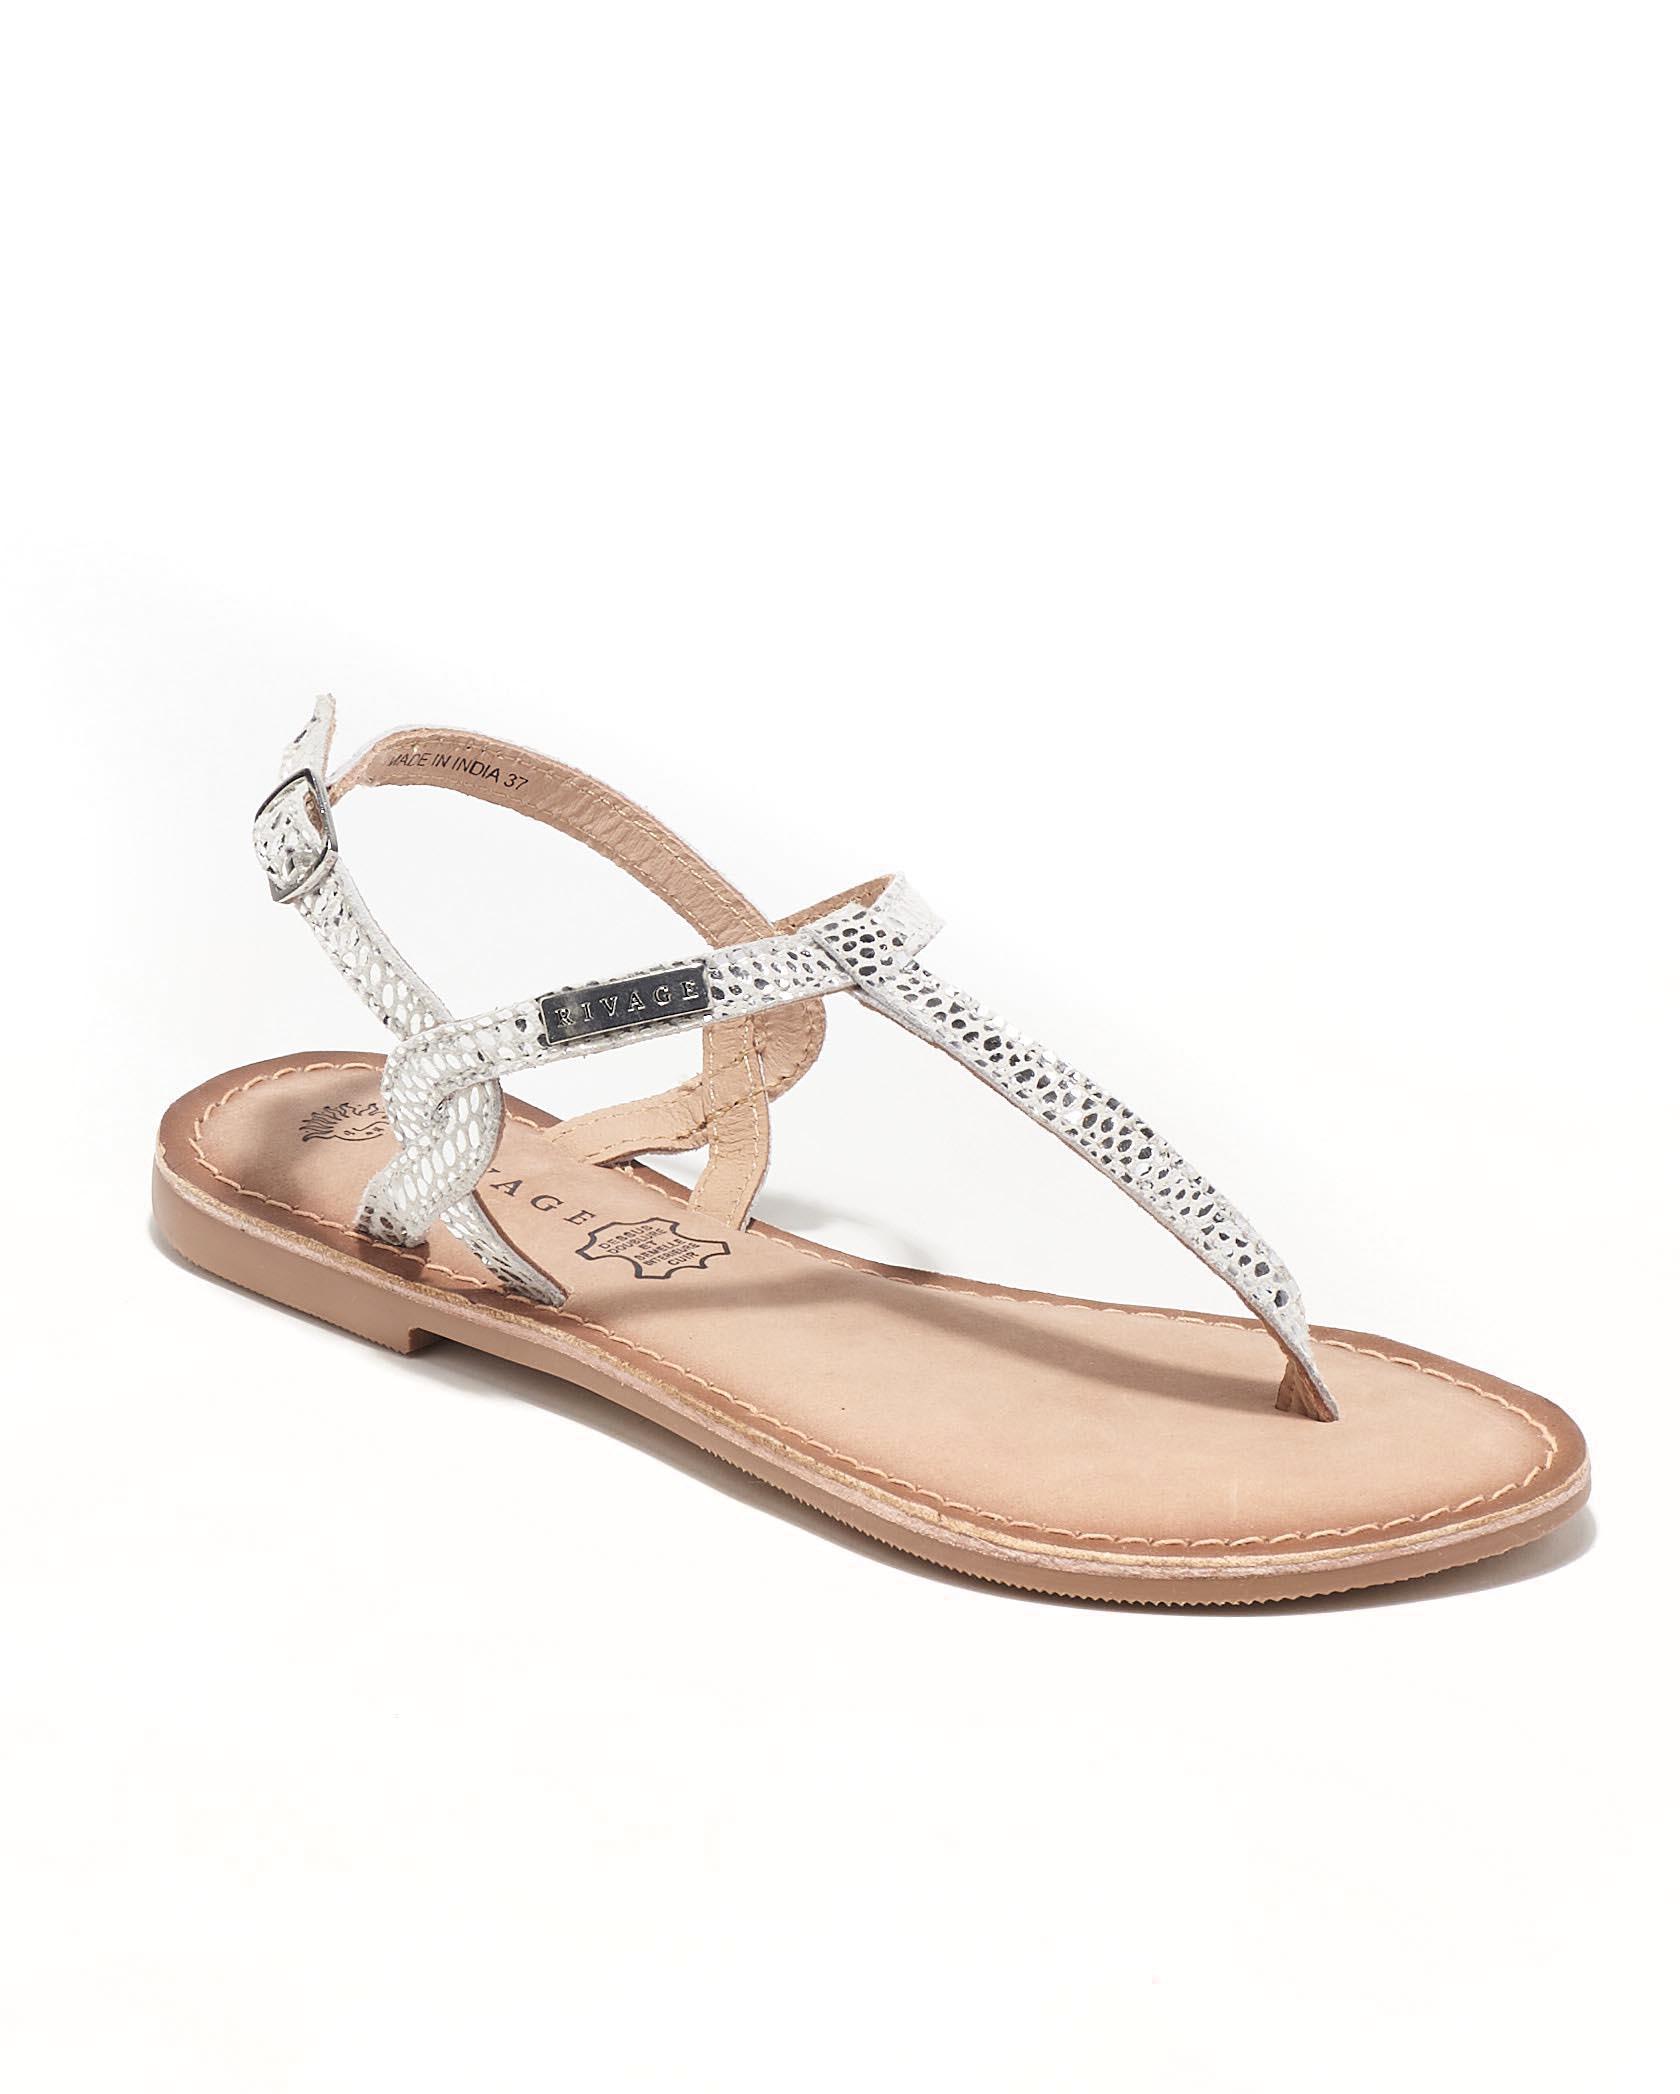 Sandales Plates Femme - Sandale Plate Argent Jina - E-020611